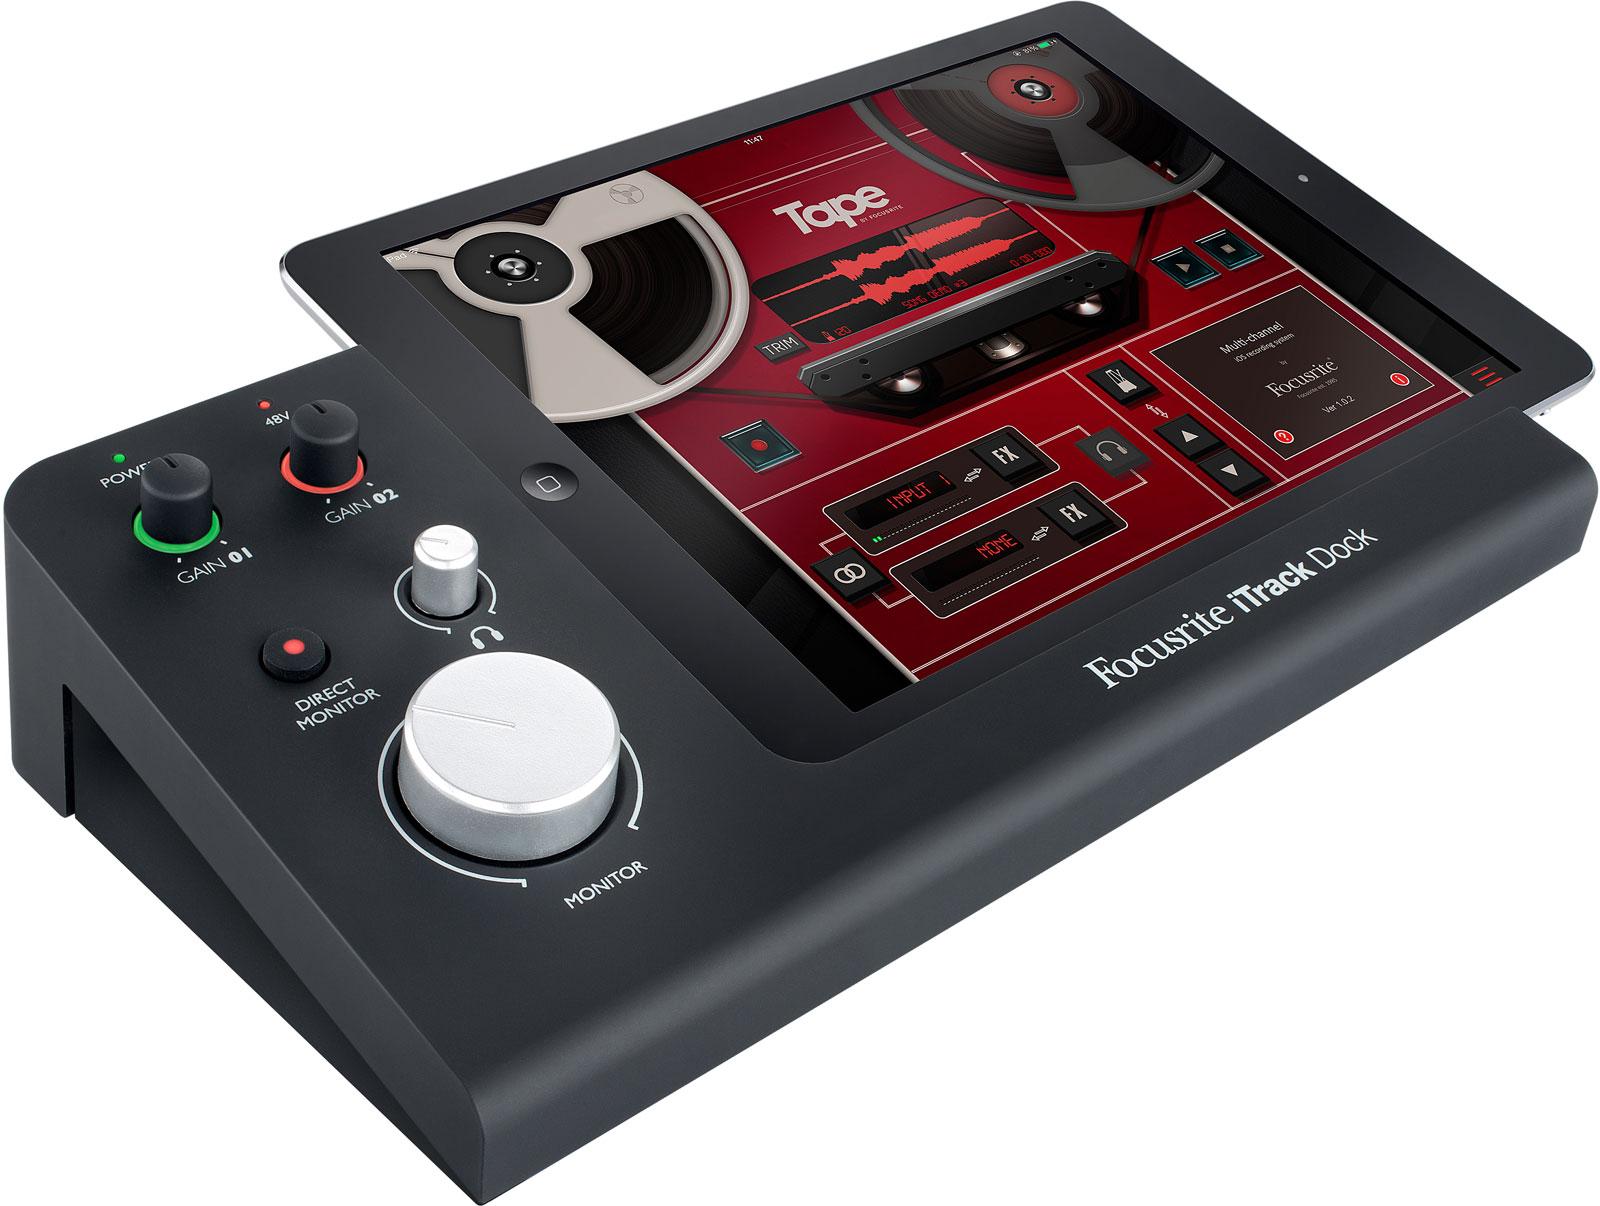 focusrite itrack dock for recording music on ipad. Black Bedroom Furniture Sets. Home Design Ideas